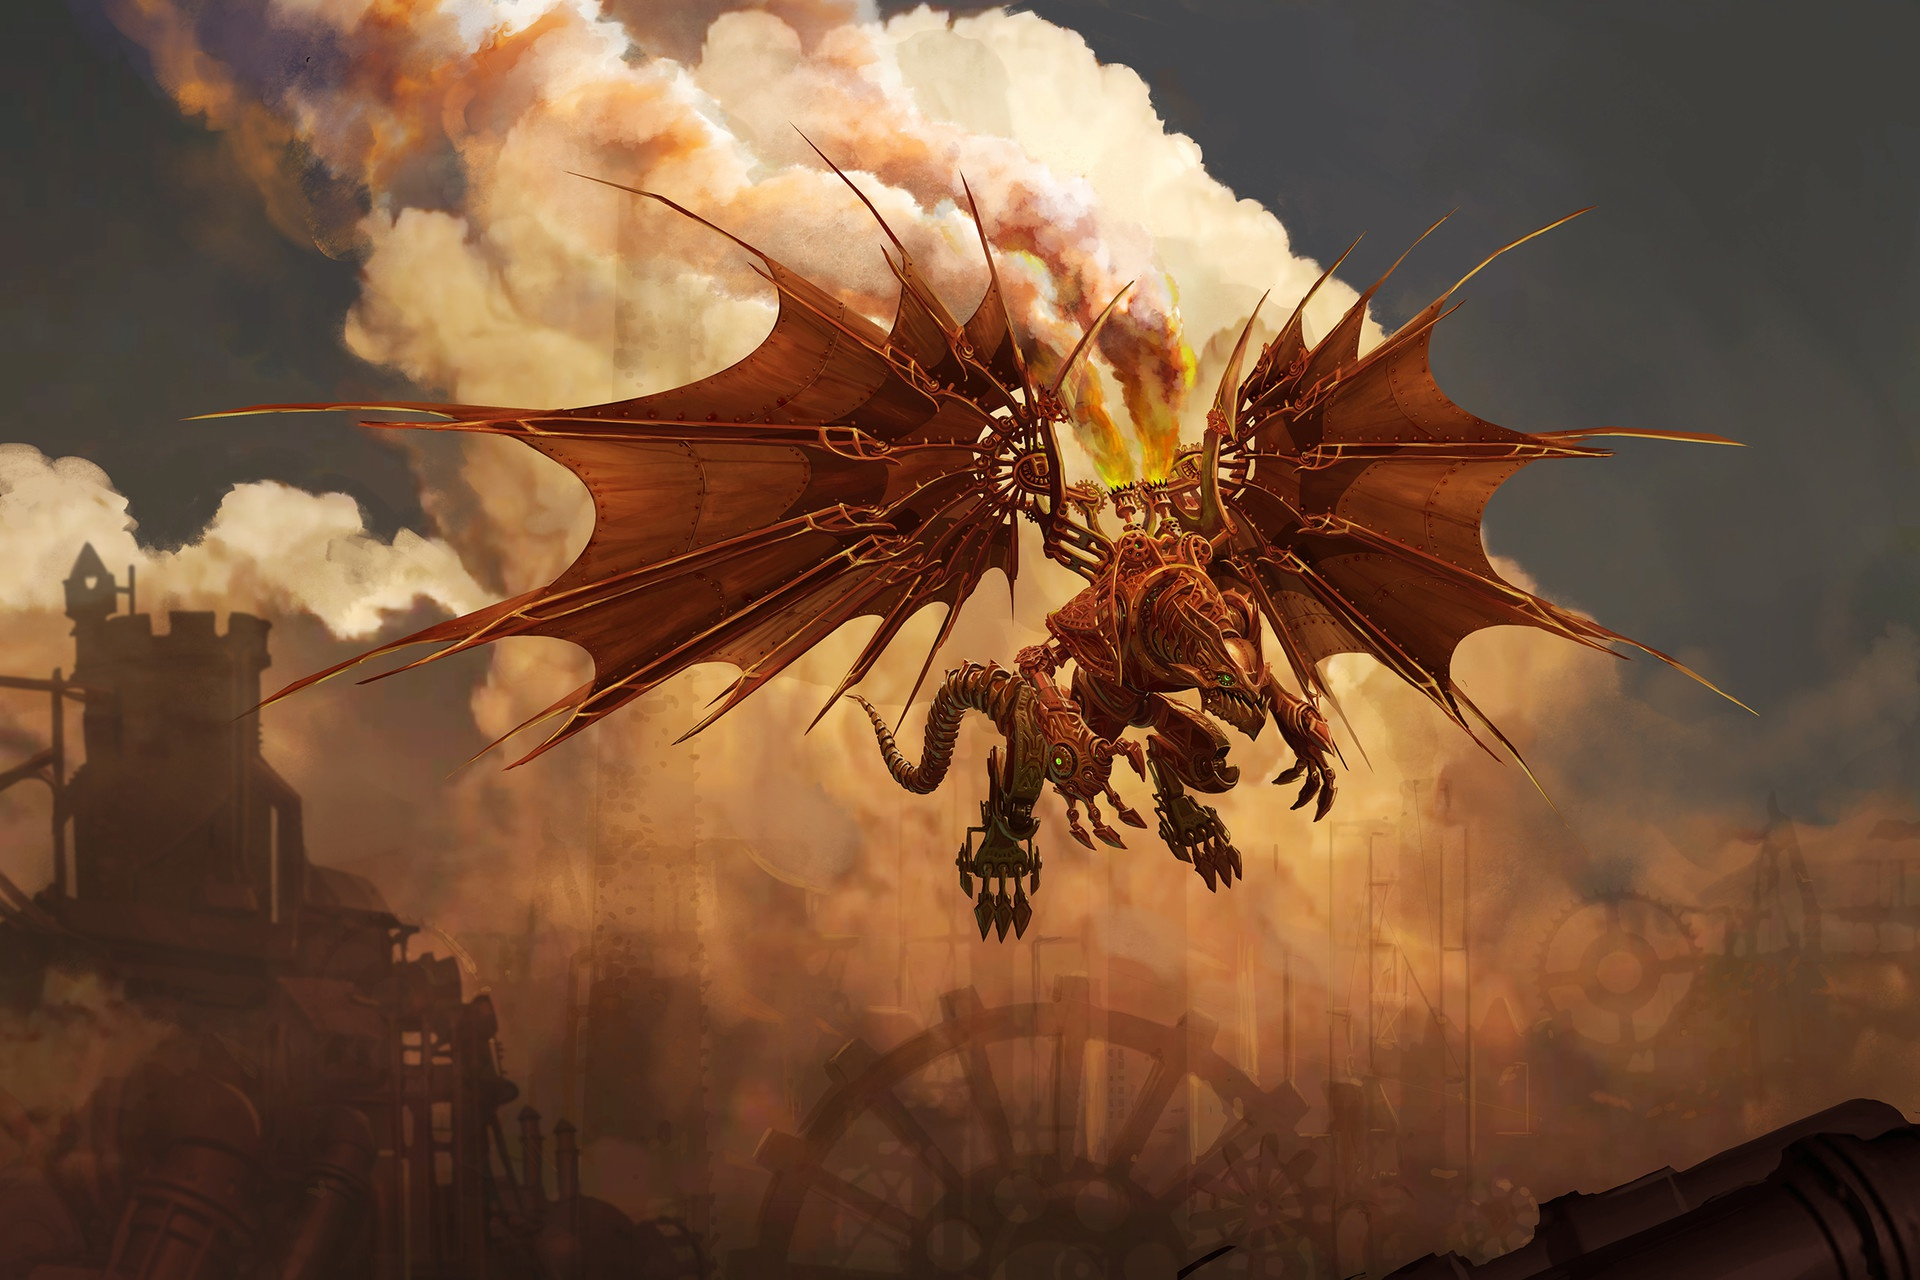 General 1920x1280 dragon creature fantasy art artwork